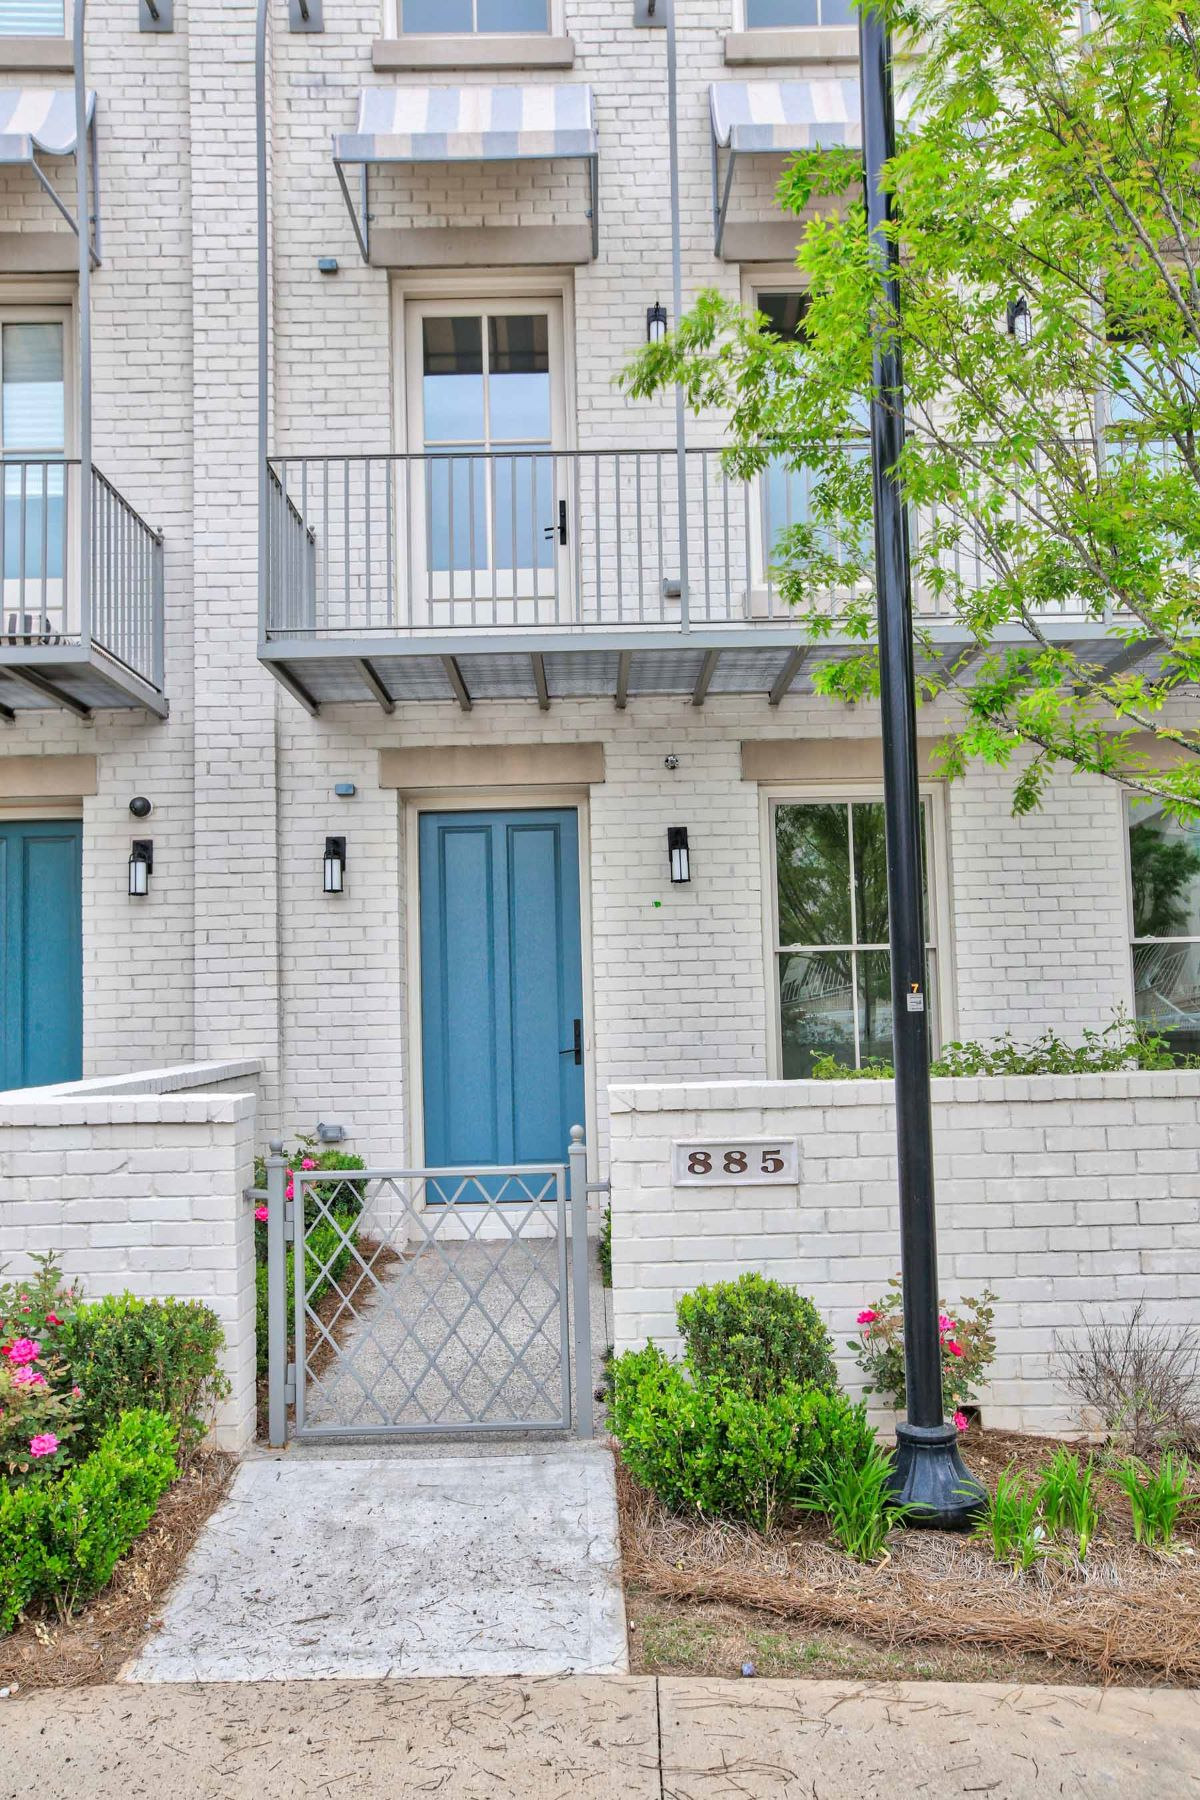 Single Family Home for Rent at Avalon Lease Row Home 885 3rd Street Alpharetta, Georgia 30009 United States